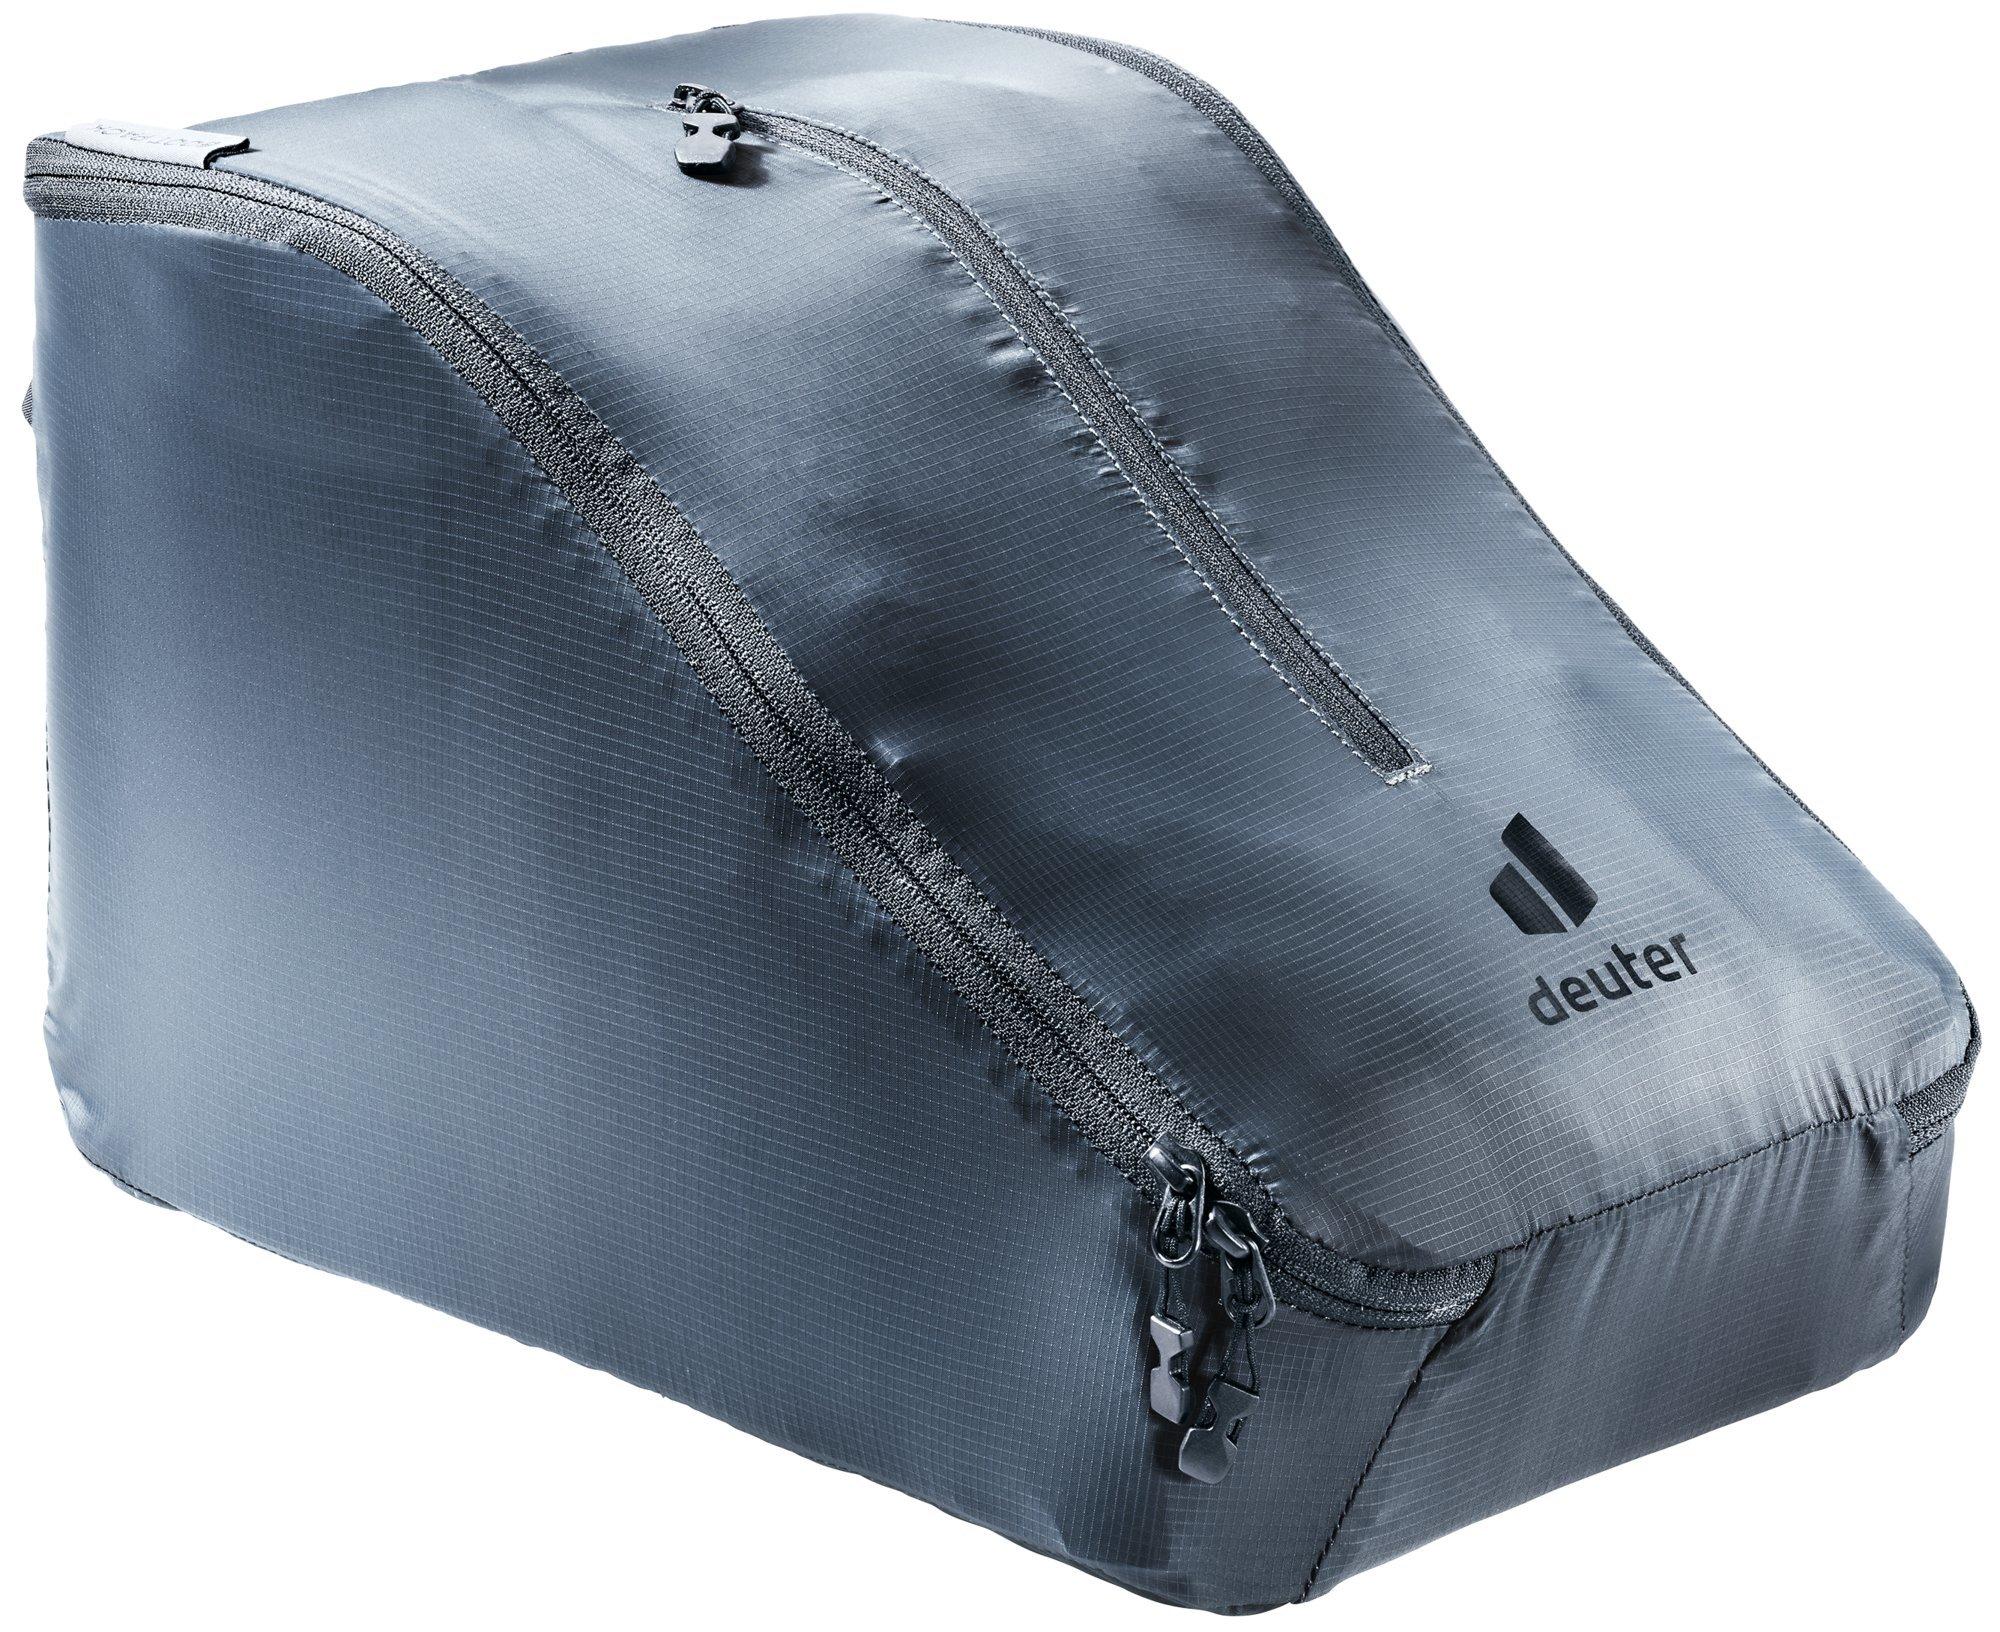 Новинки Упаковочный мешок Deuter Boot Pack (2021) 3946221-4014-BootPack-w20-d0.jpg